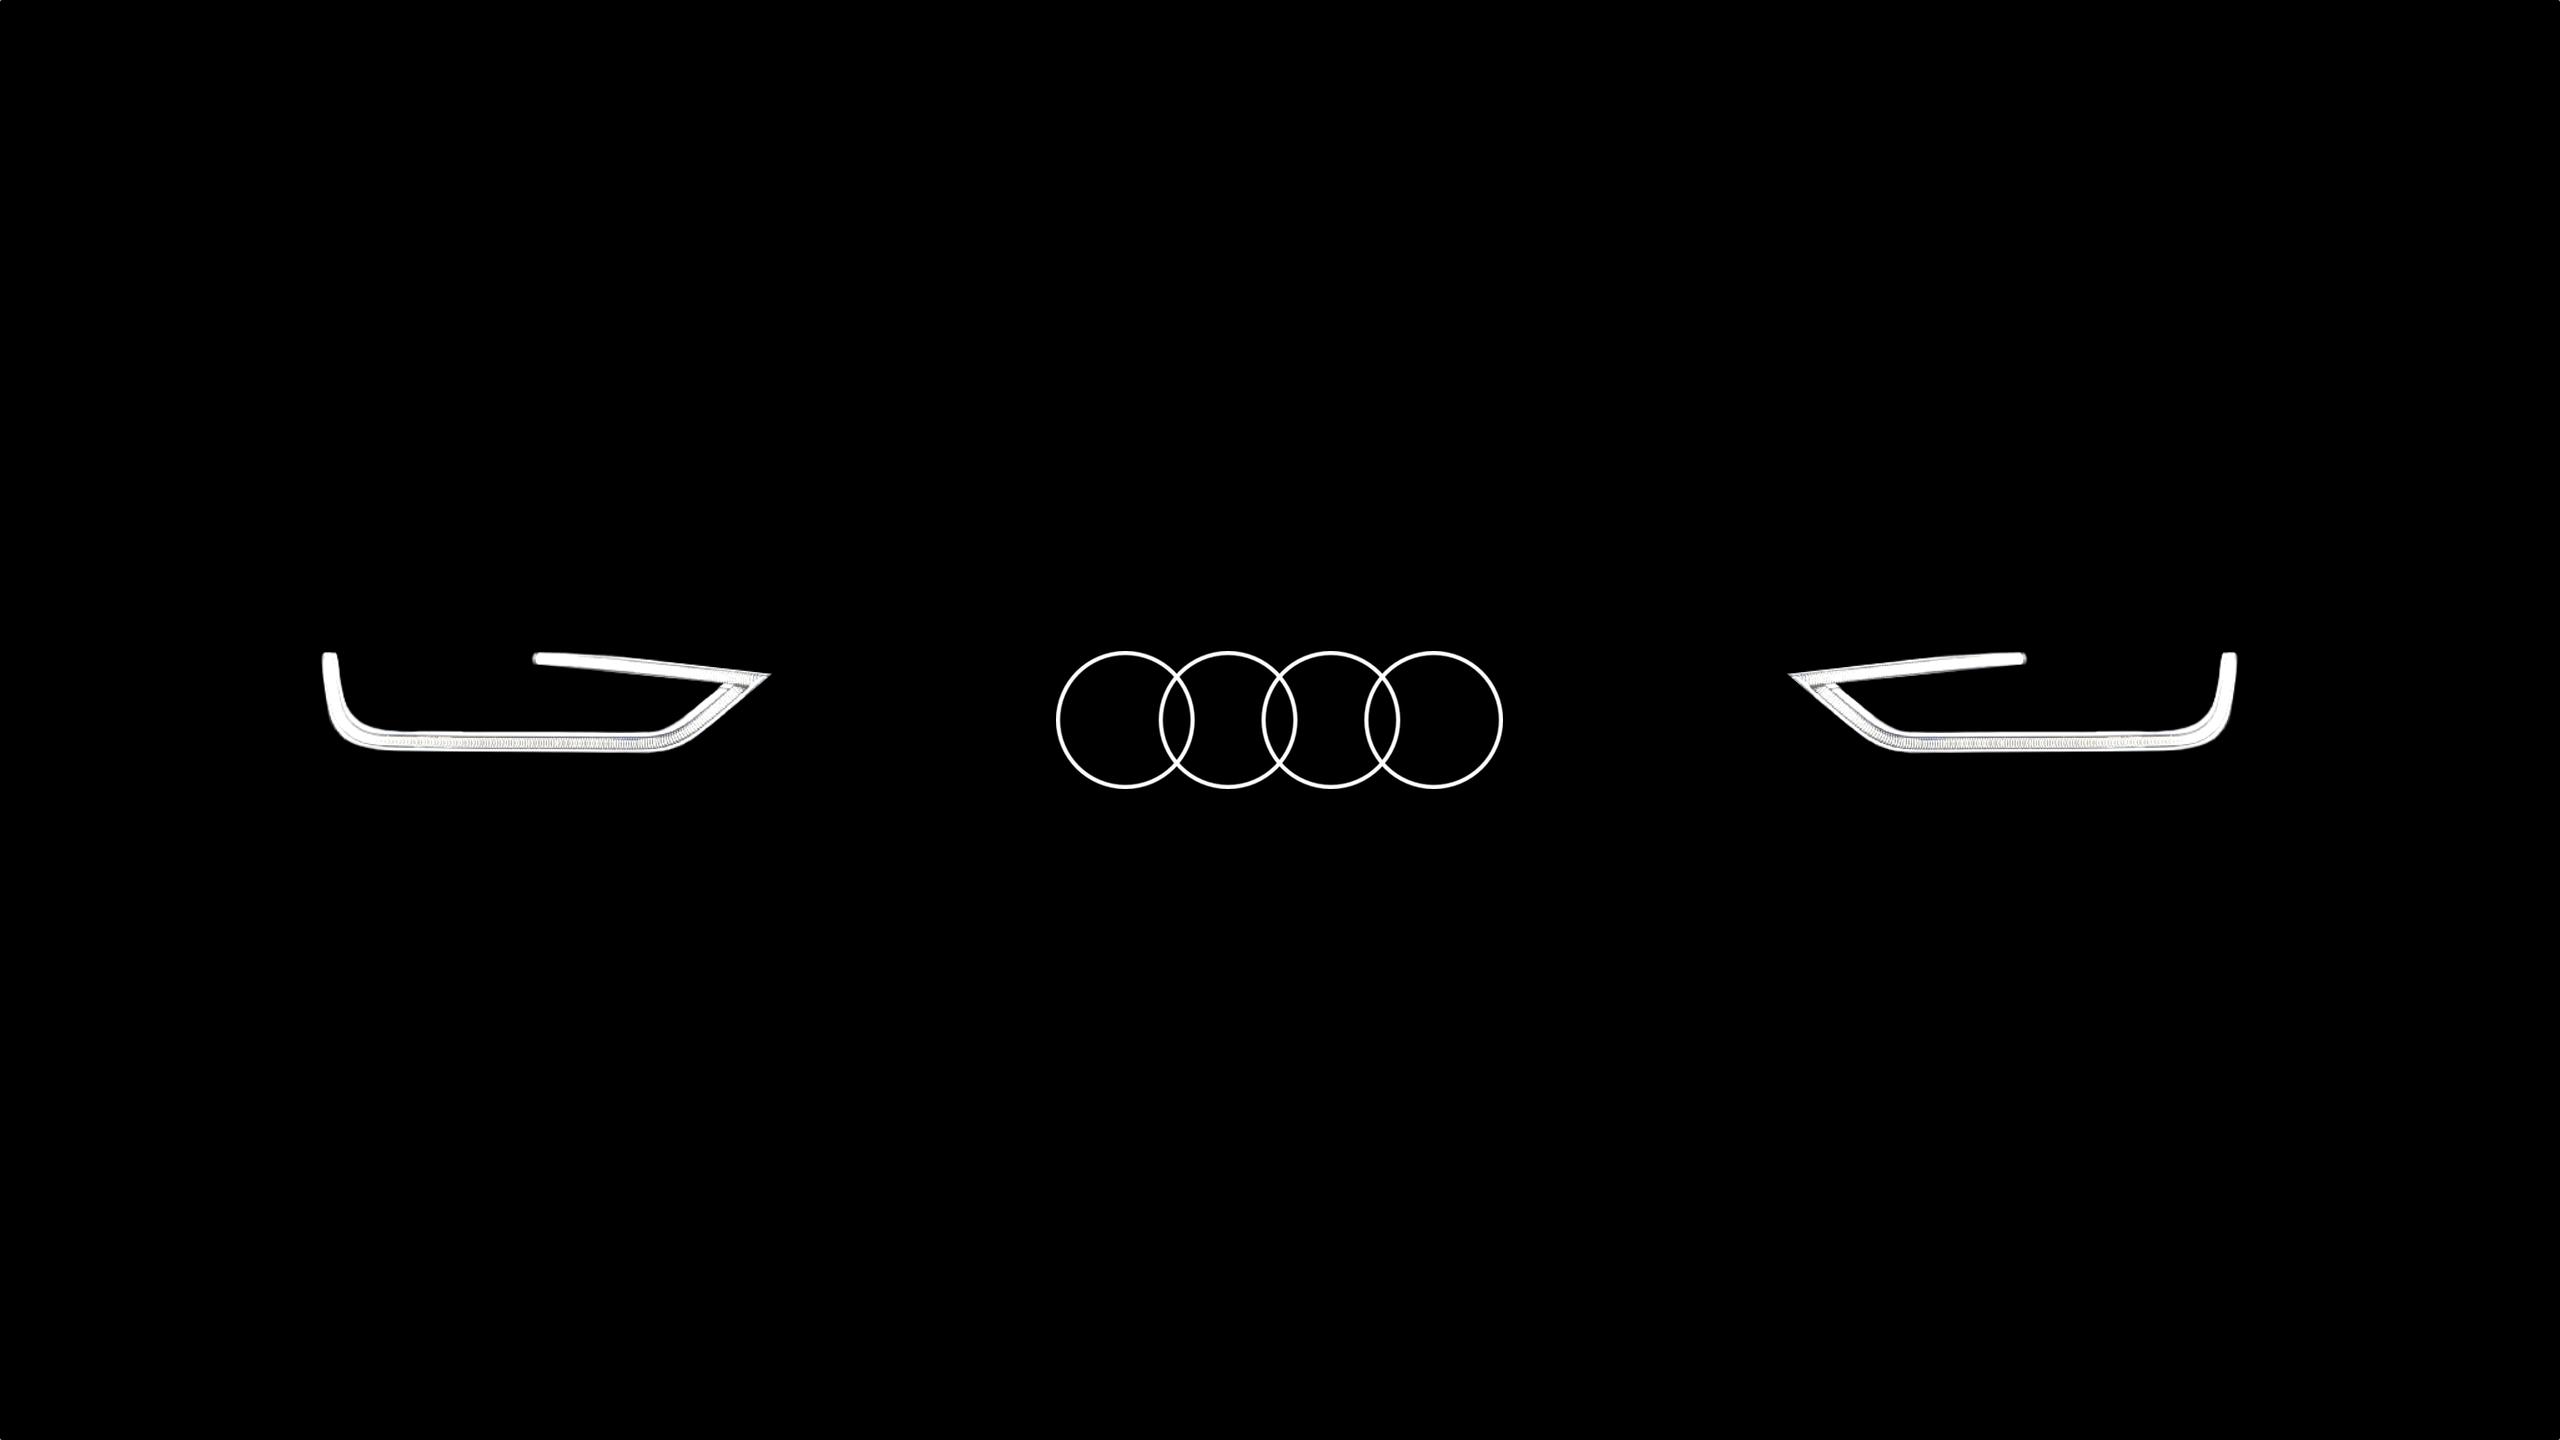 Audi-Logo-Wallpaper-Background-58773